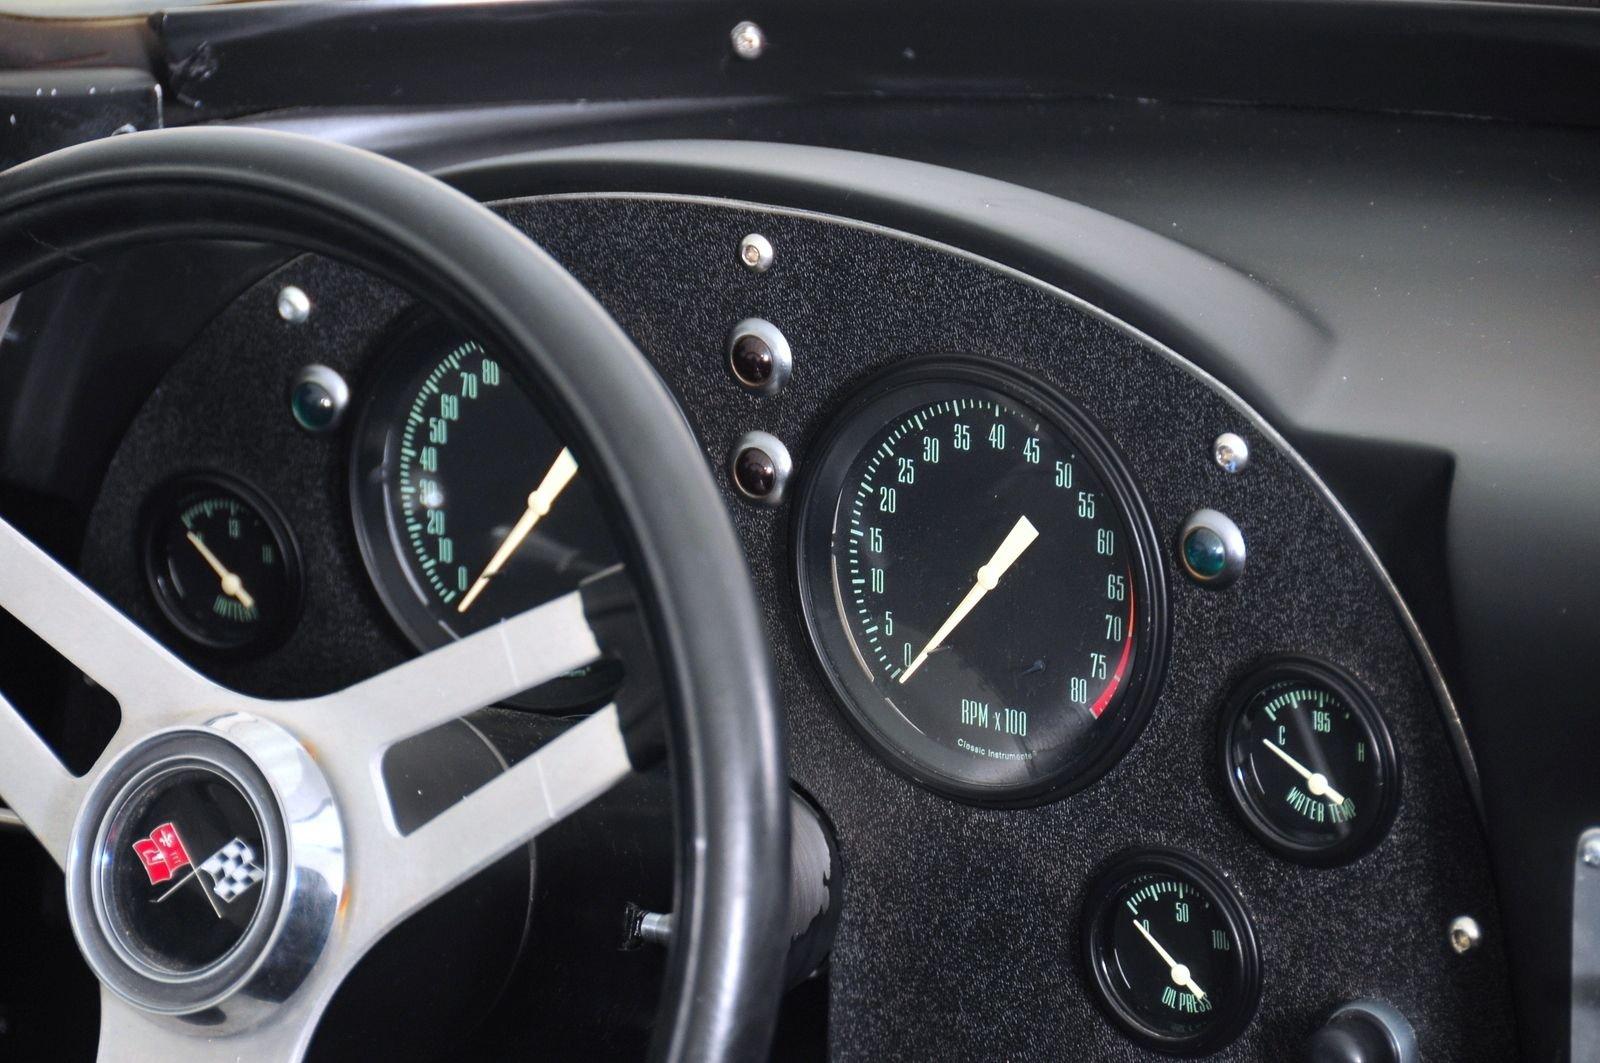 1963 Chevrolet Corvette Mongoose Motorsports Grand Sport Fast Five gauge instruments interior dash